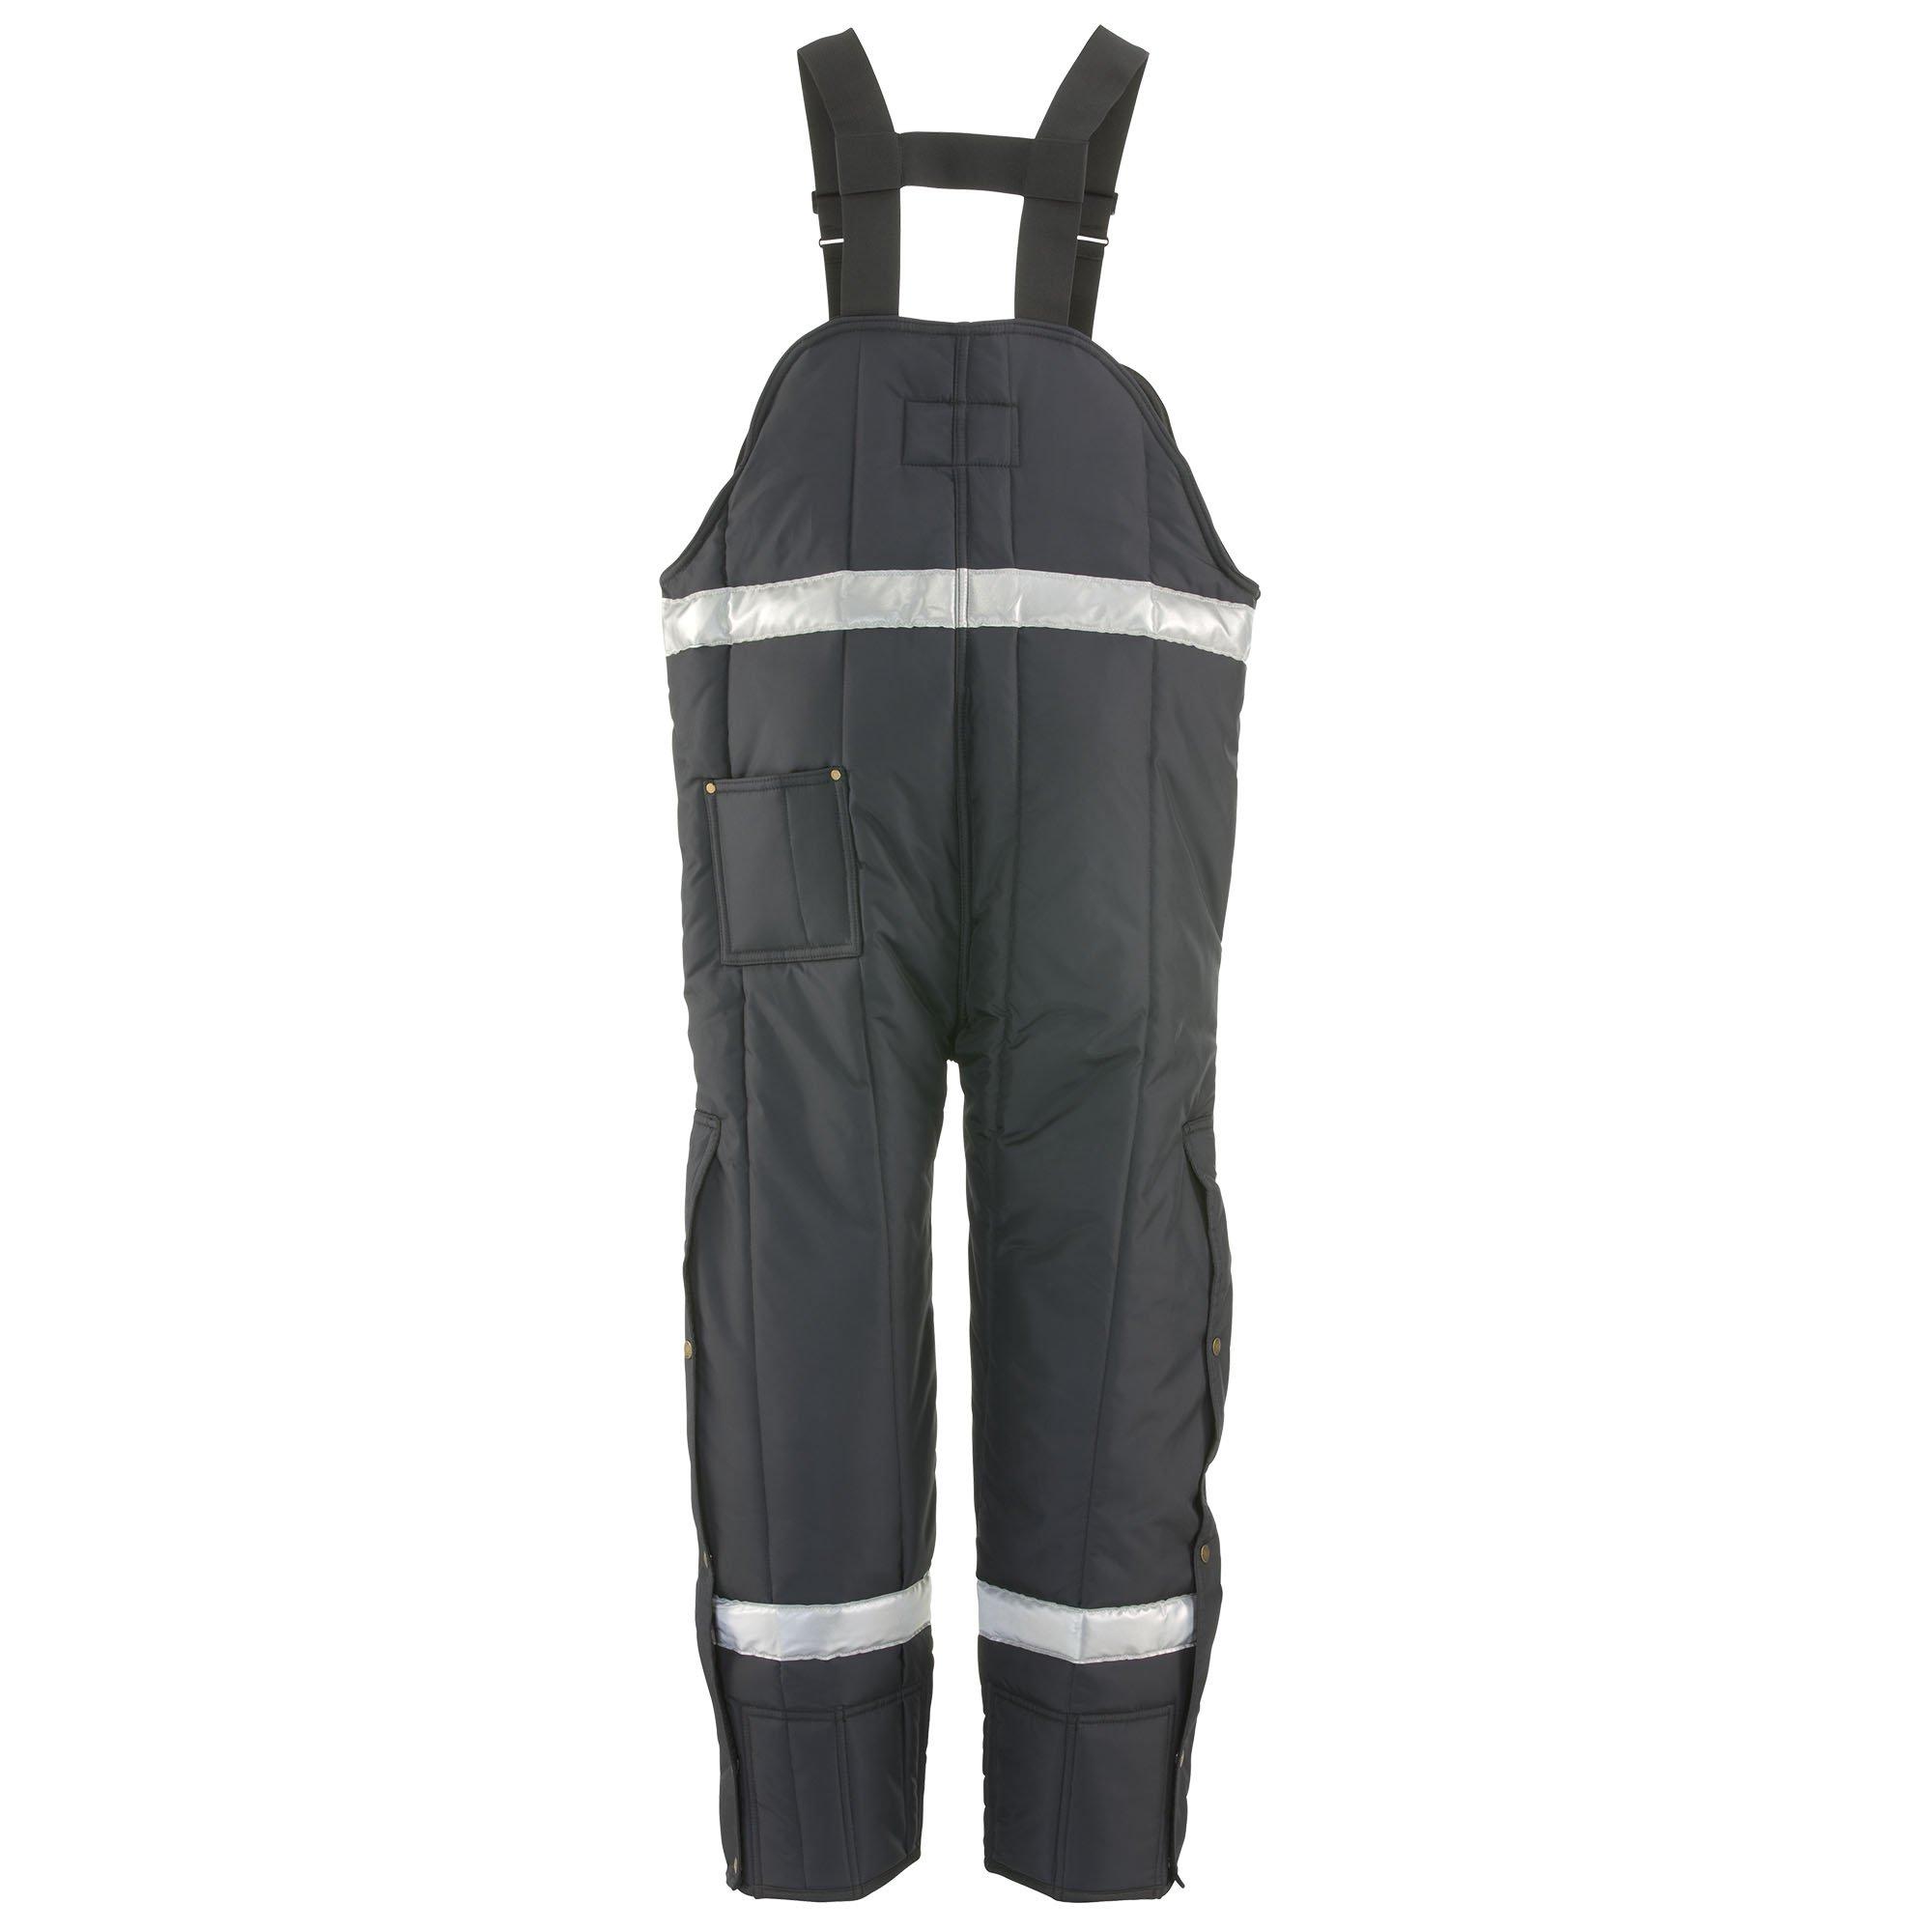 RefrigiWear Men's Iron-Tuff Enhanced Visibility High Bib, Navy, 3XL Short by Refrigiwear (Image #2)